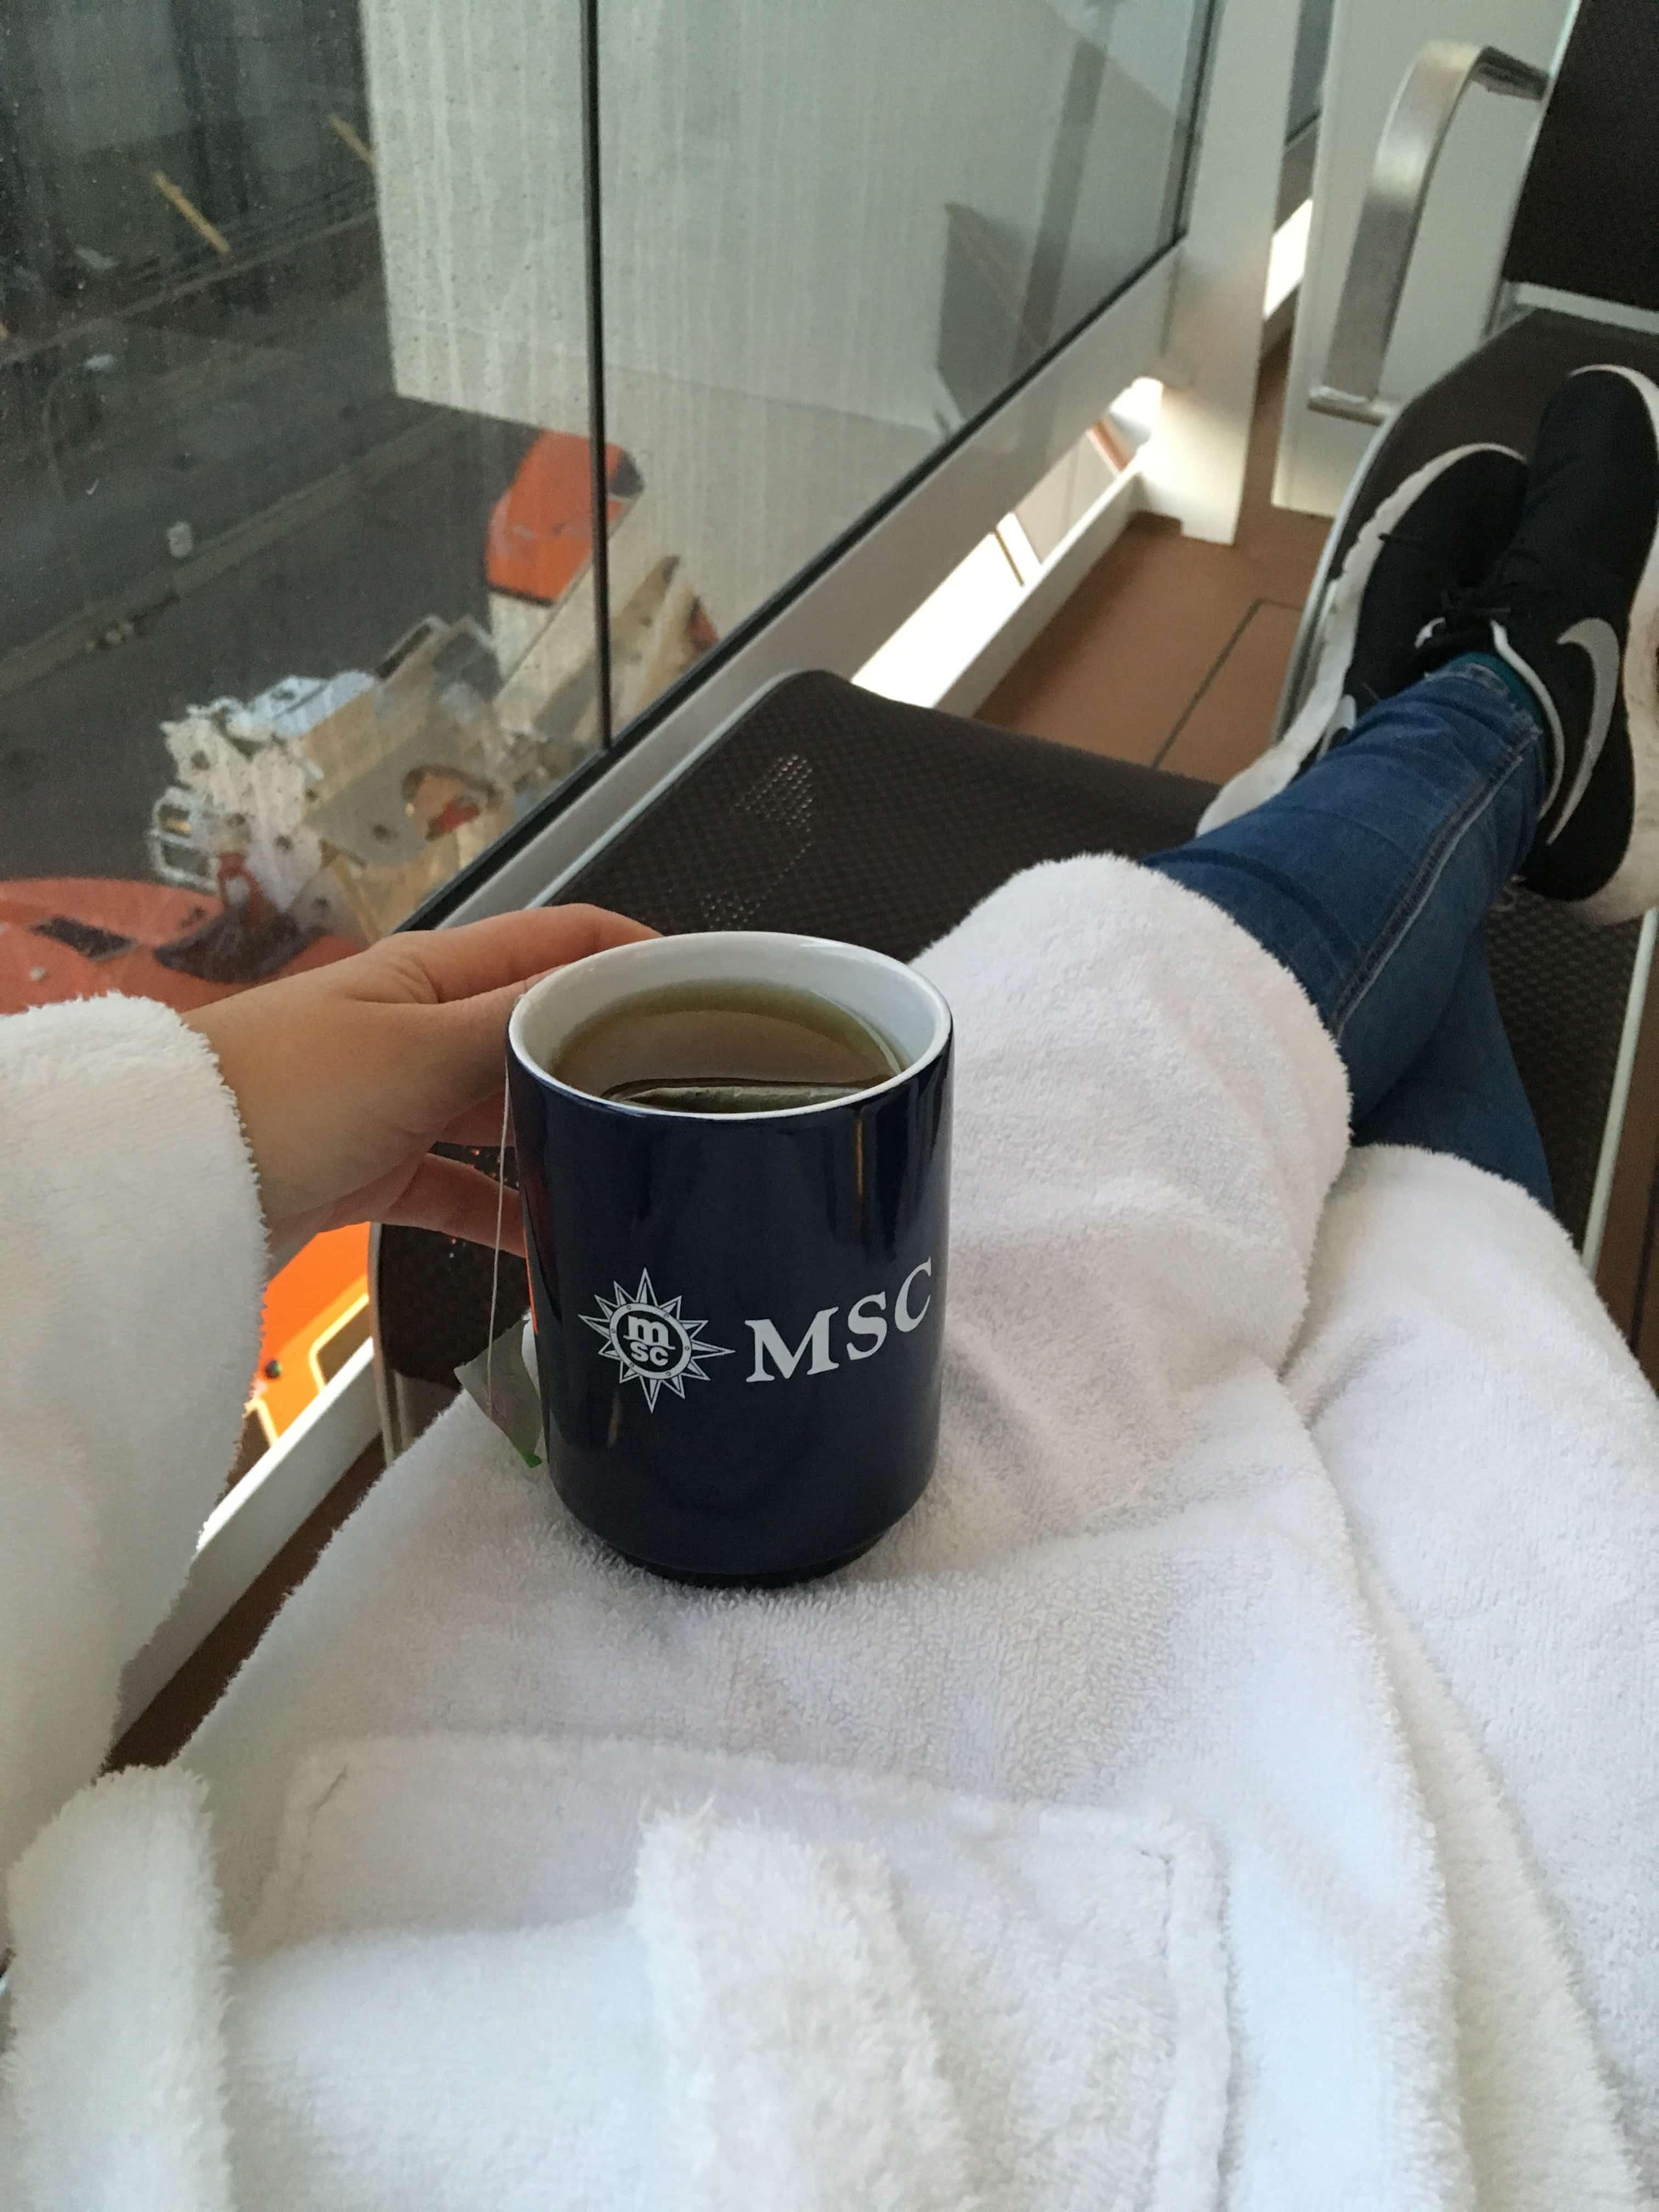 msc meraviglia tea on the balcony dressing gown bath robe